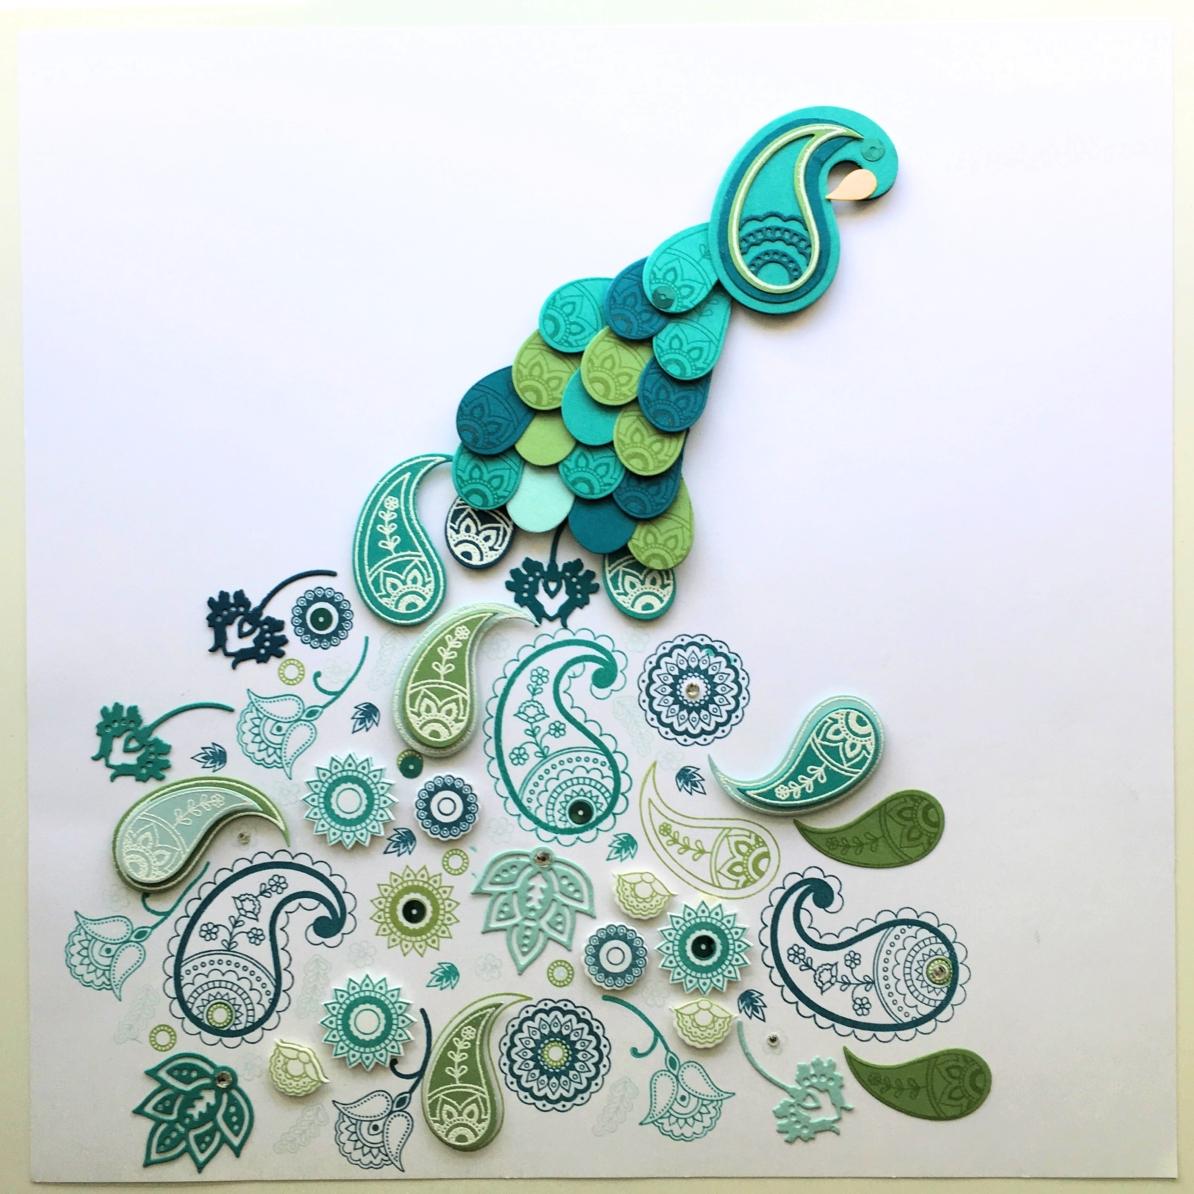 DIY Peacock Craft: Stampin Up! Paisleys & Posies Peacock Art from StampinFool.com